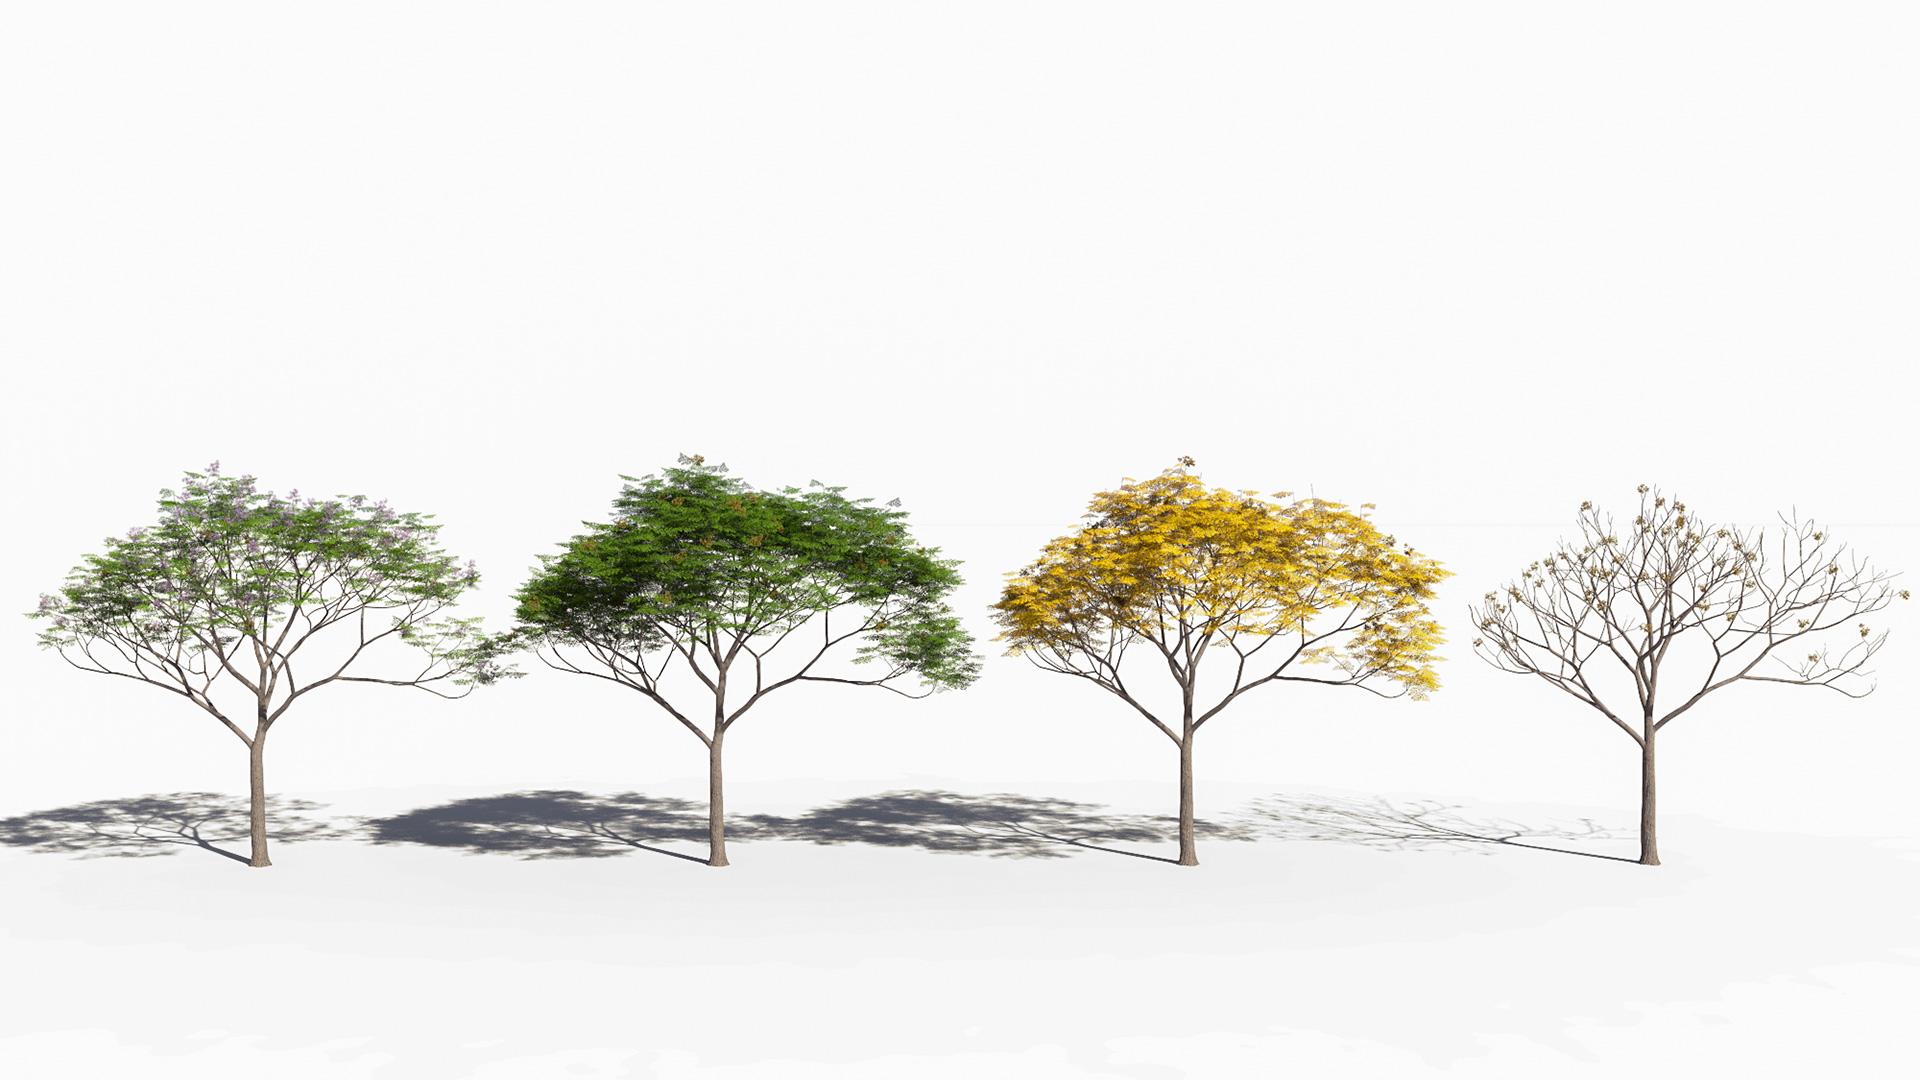 3D model of the Chinaberry tree Melia azedarach season variations